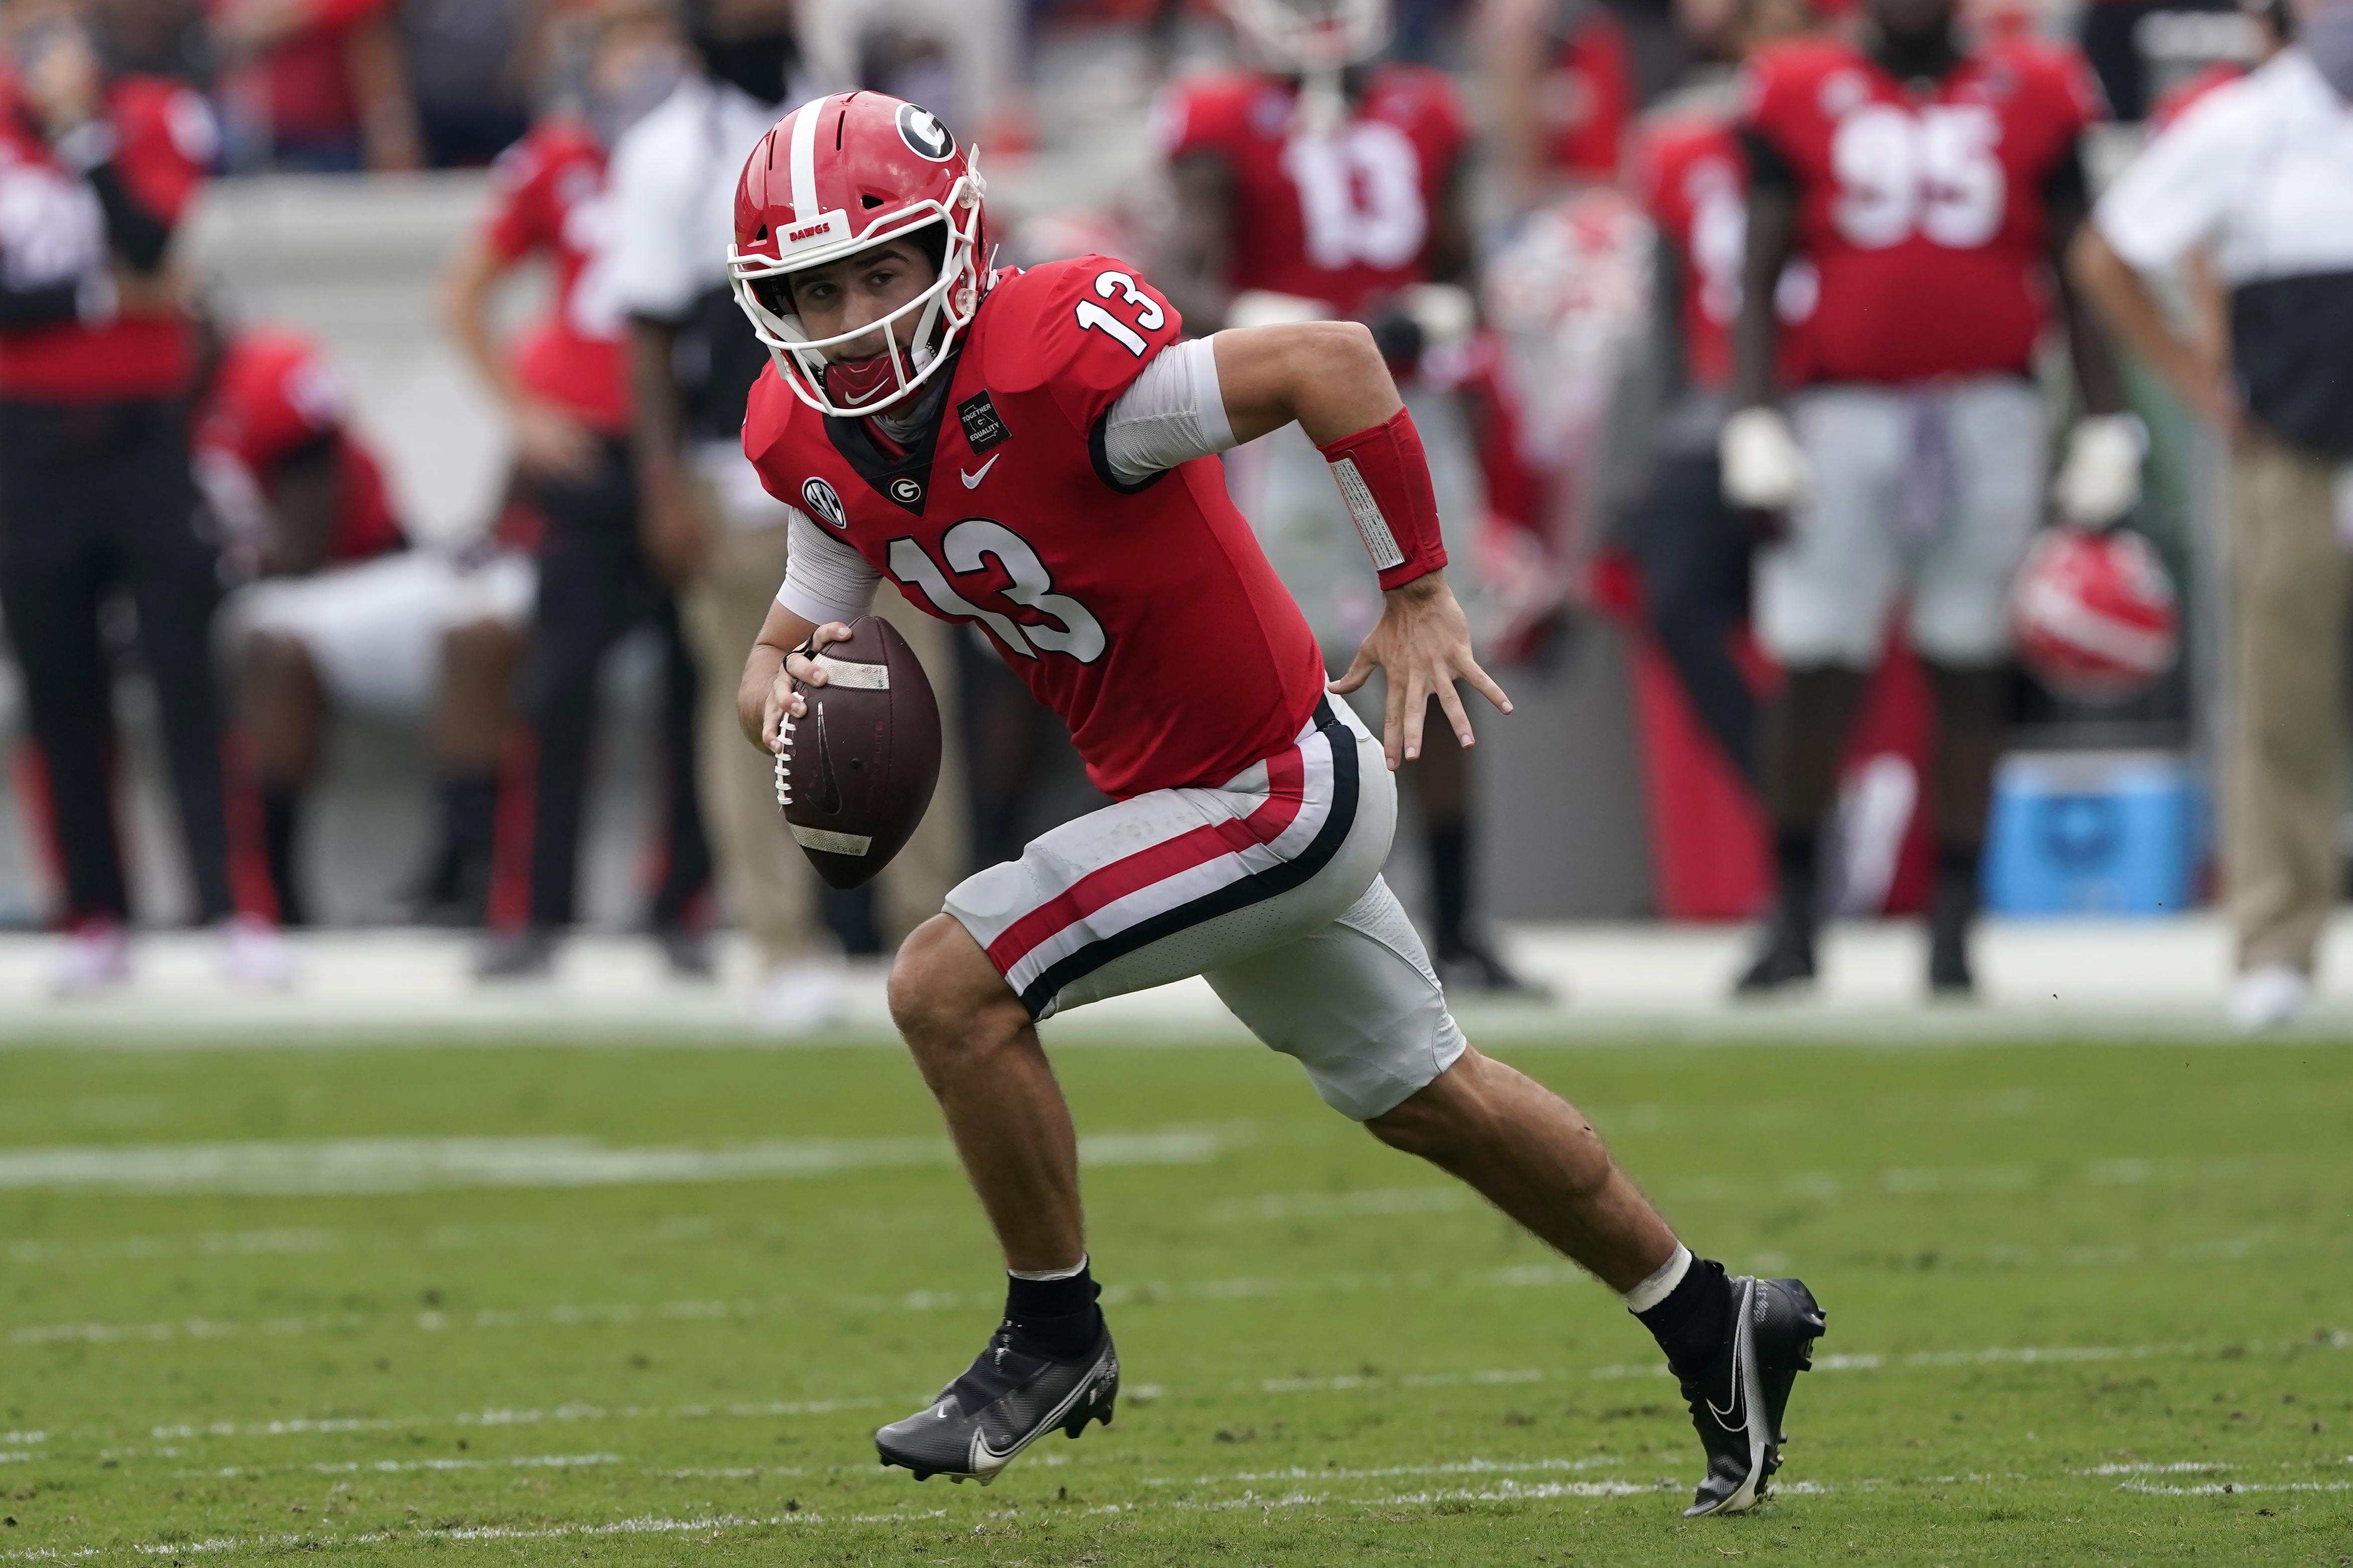 Georgia Bulldogs Vs Florida Gators Free Live Stream 11 7 20 How To Watch College Football Games Time Pennlive Com